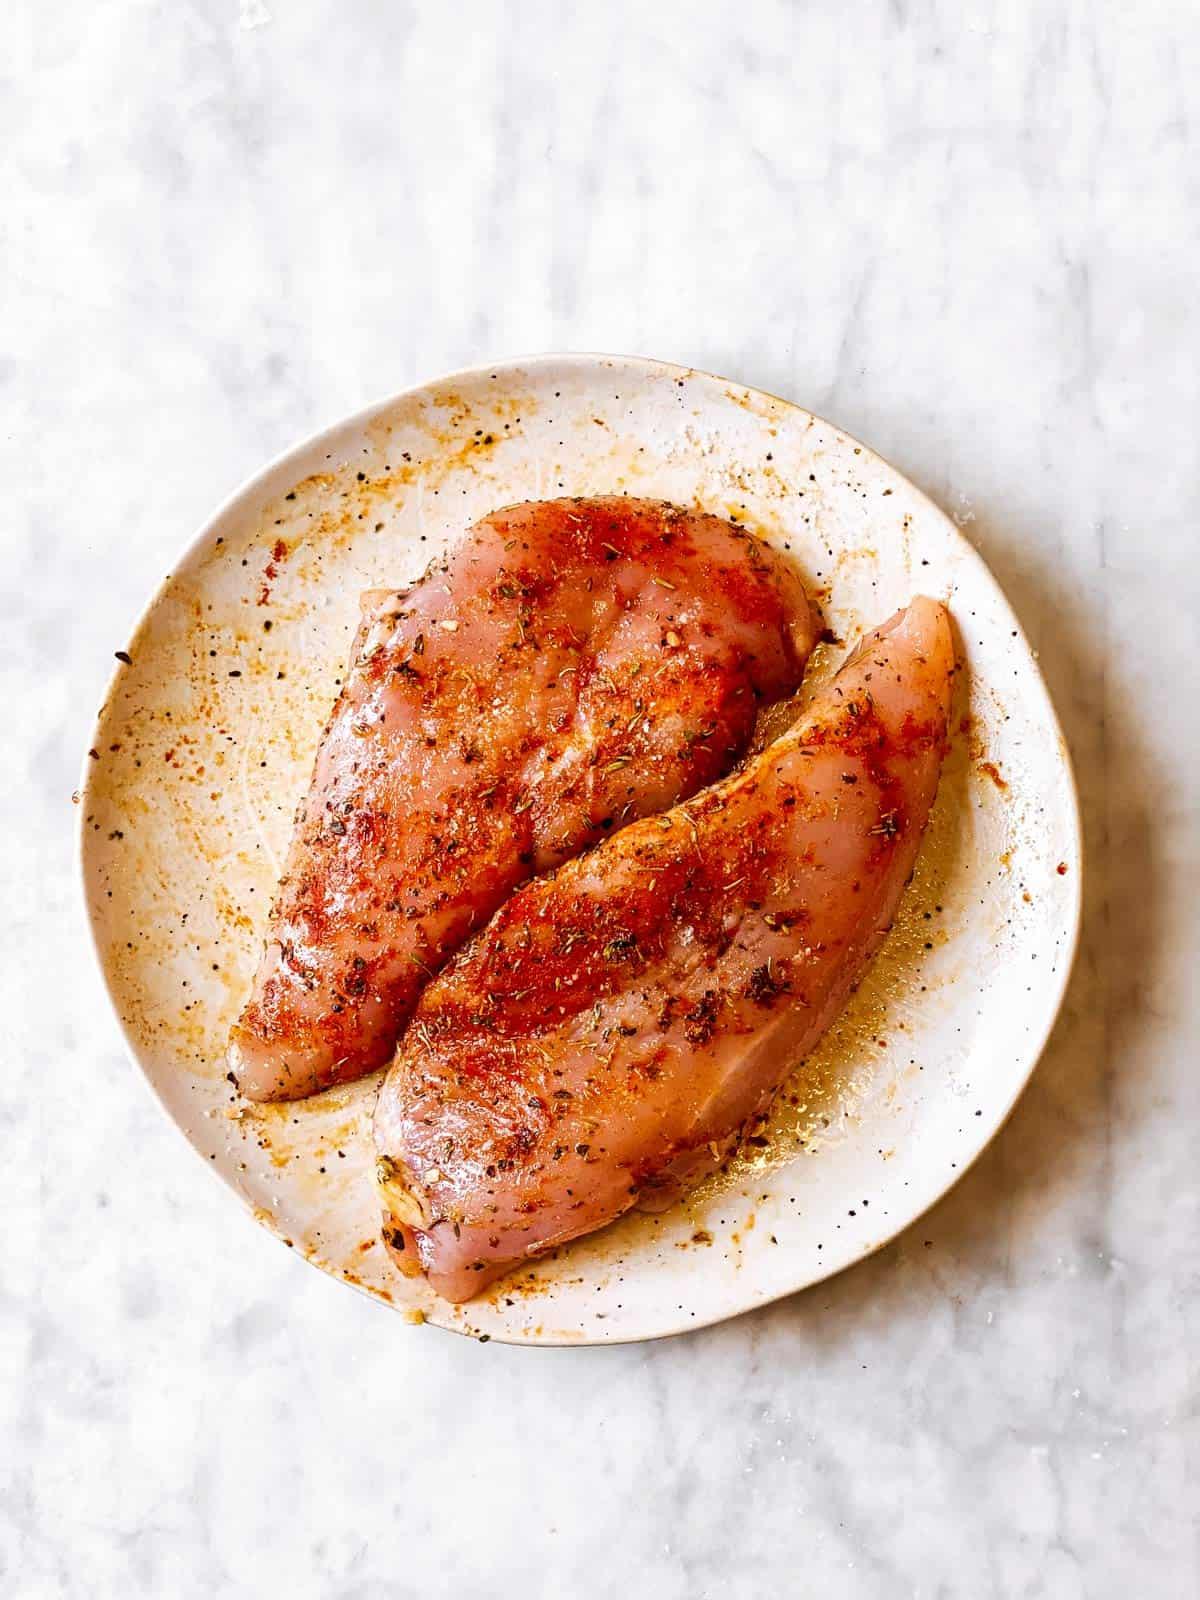 seasoned chicken breasts on white plate